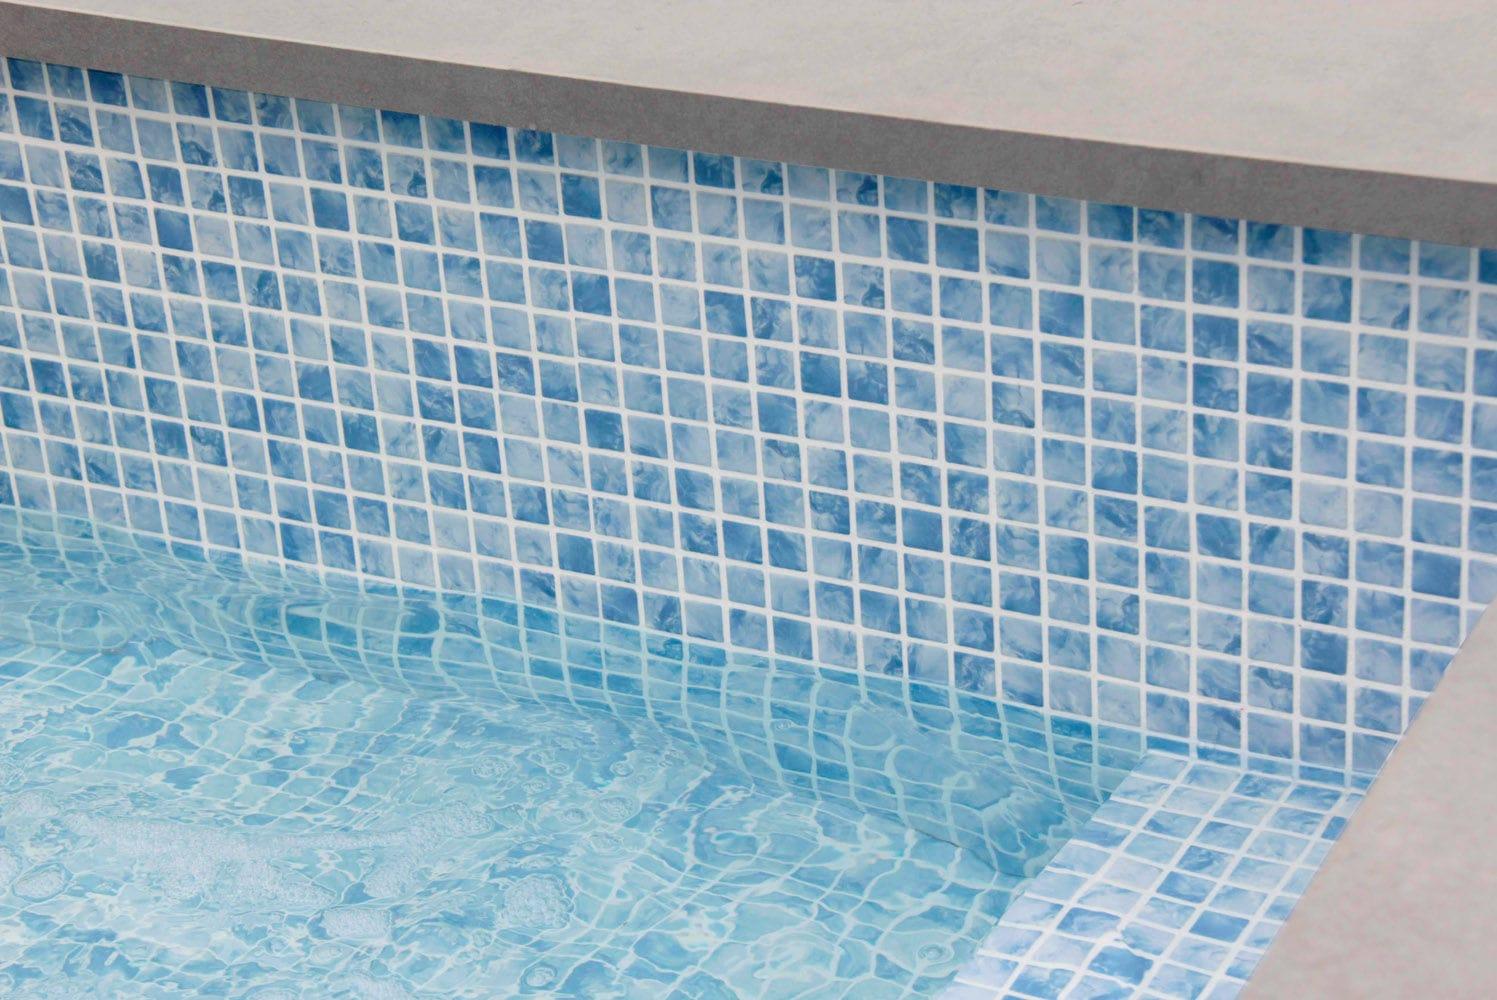 Pool mosaic tile / floor / glass / high-gloss - SAONA - Mosavit